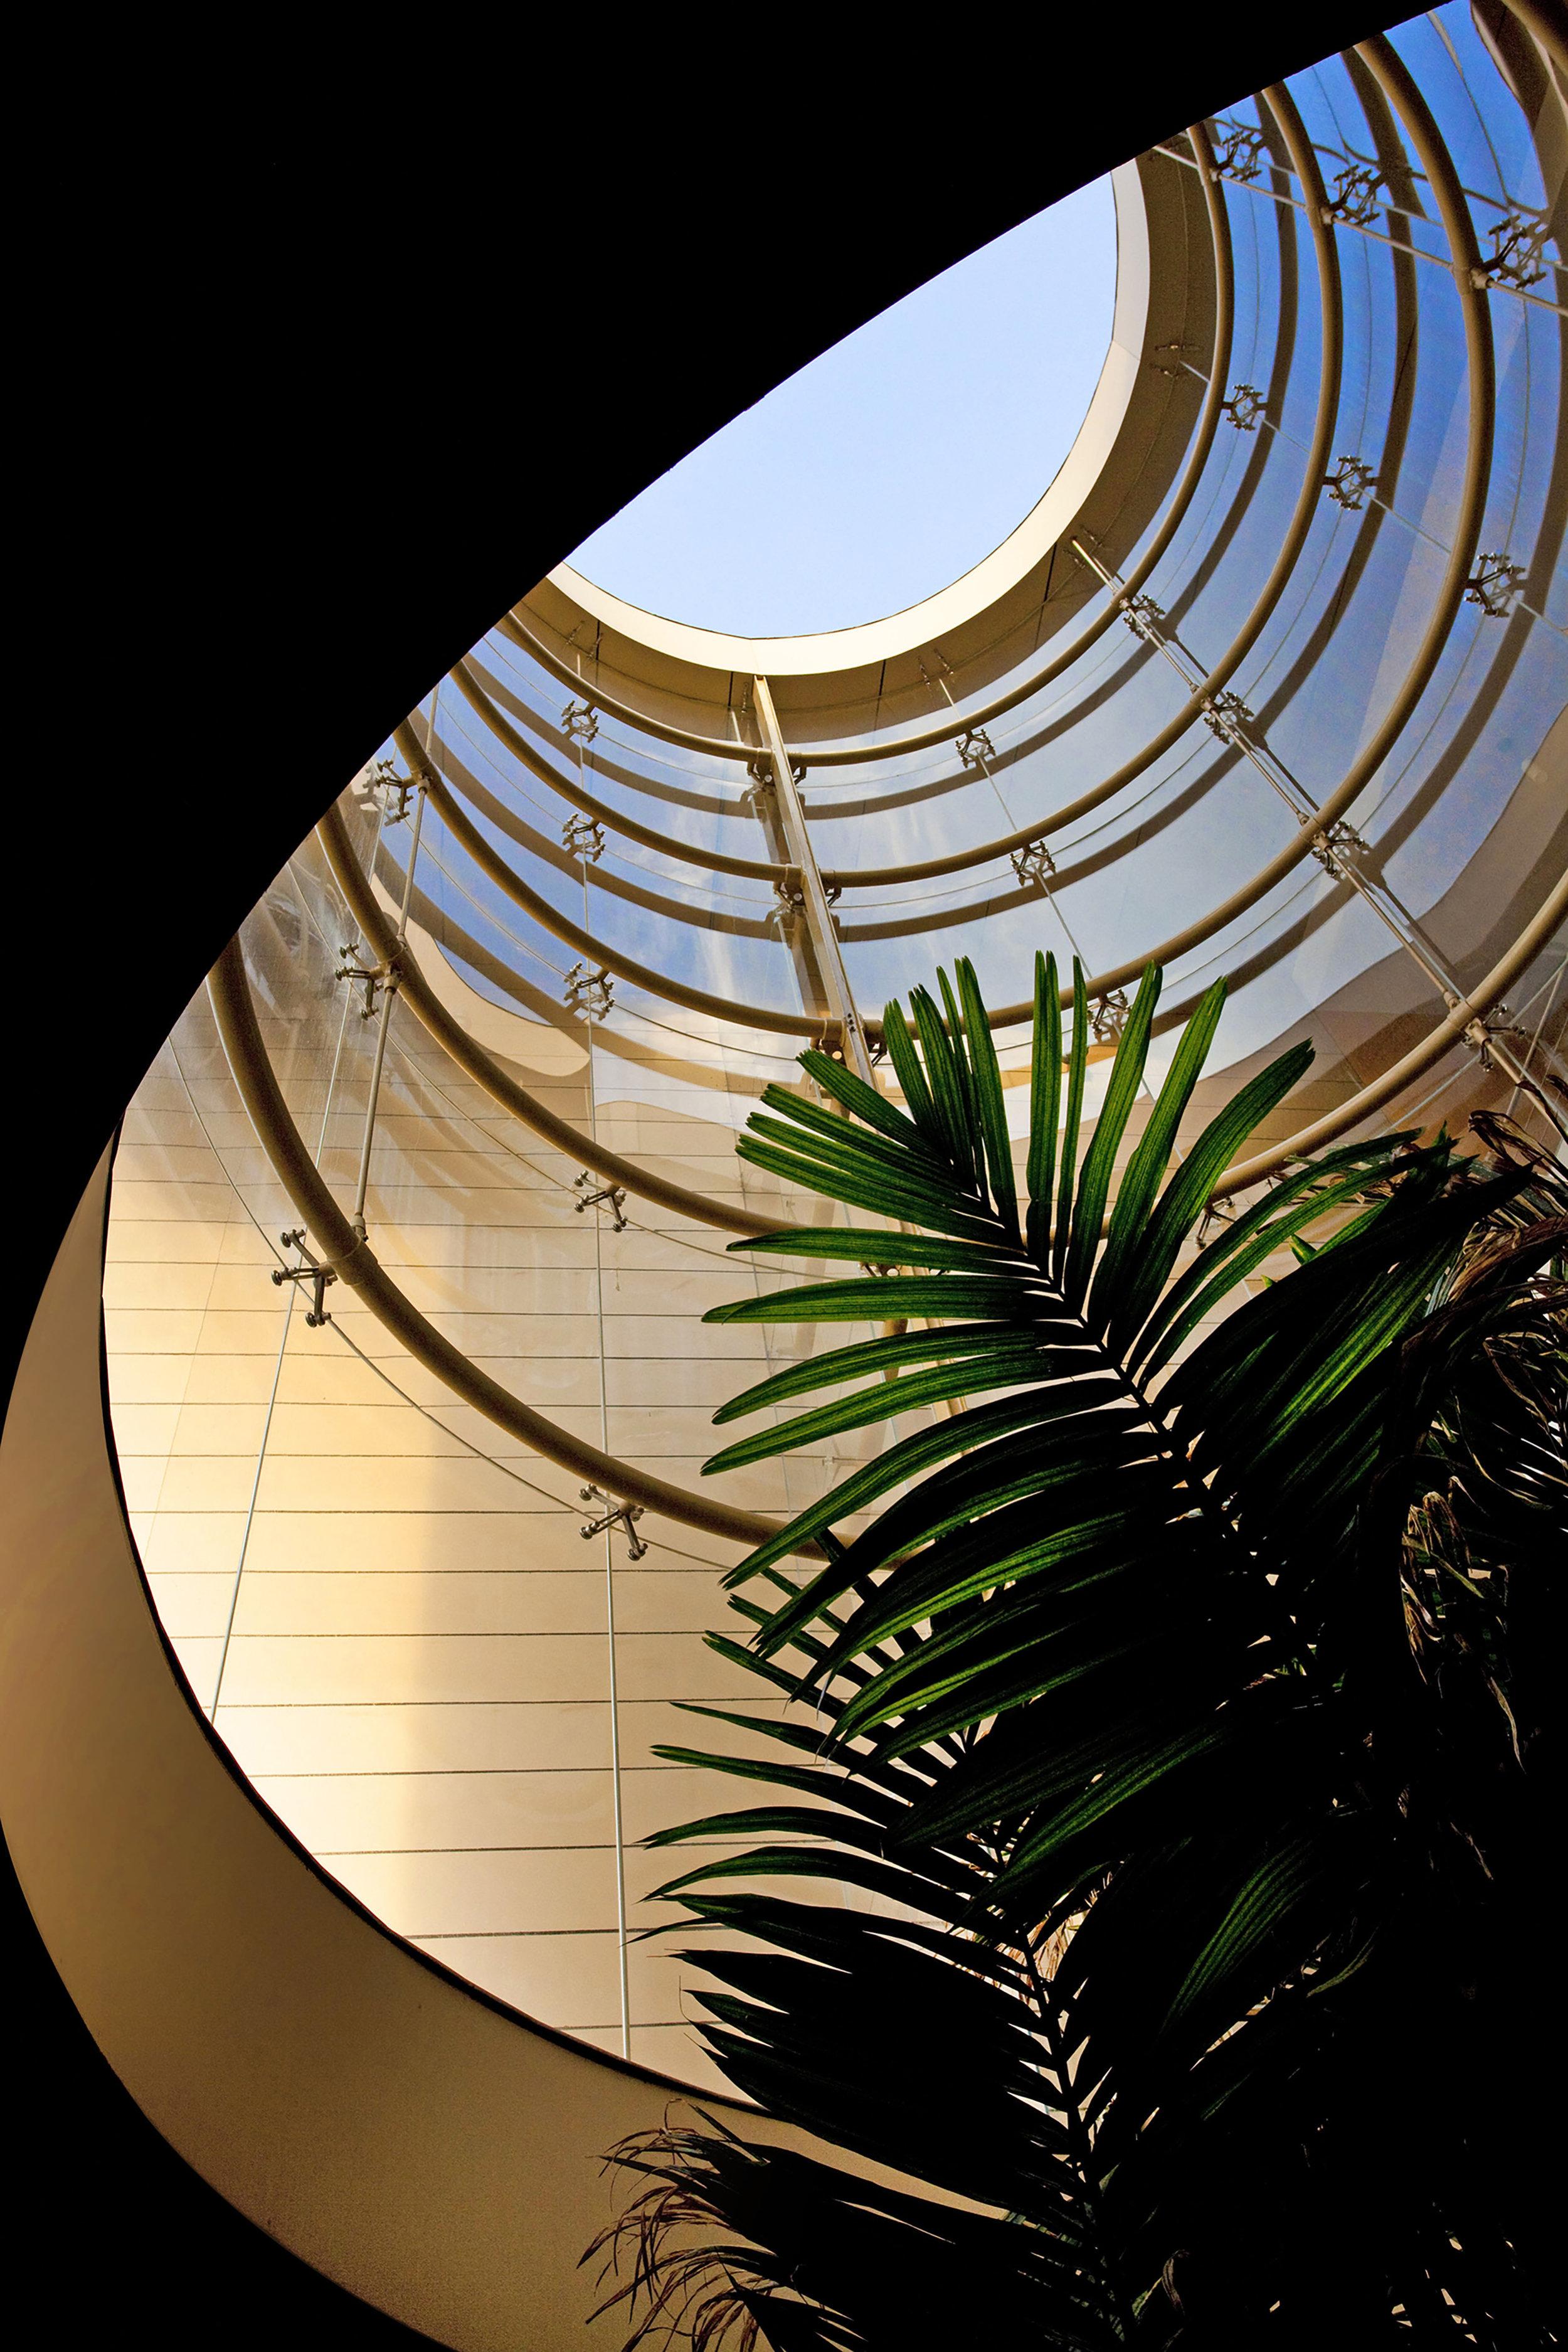 Harminder Photography Architecture_Suzlon-june'2010_MG_0182.jpg